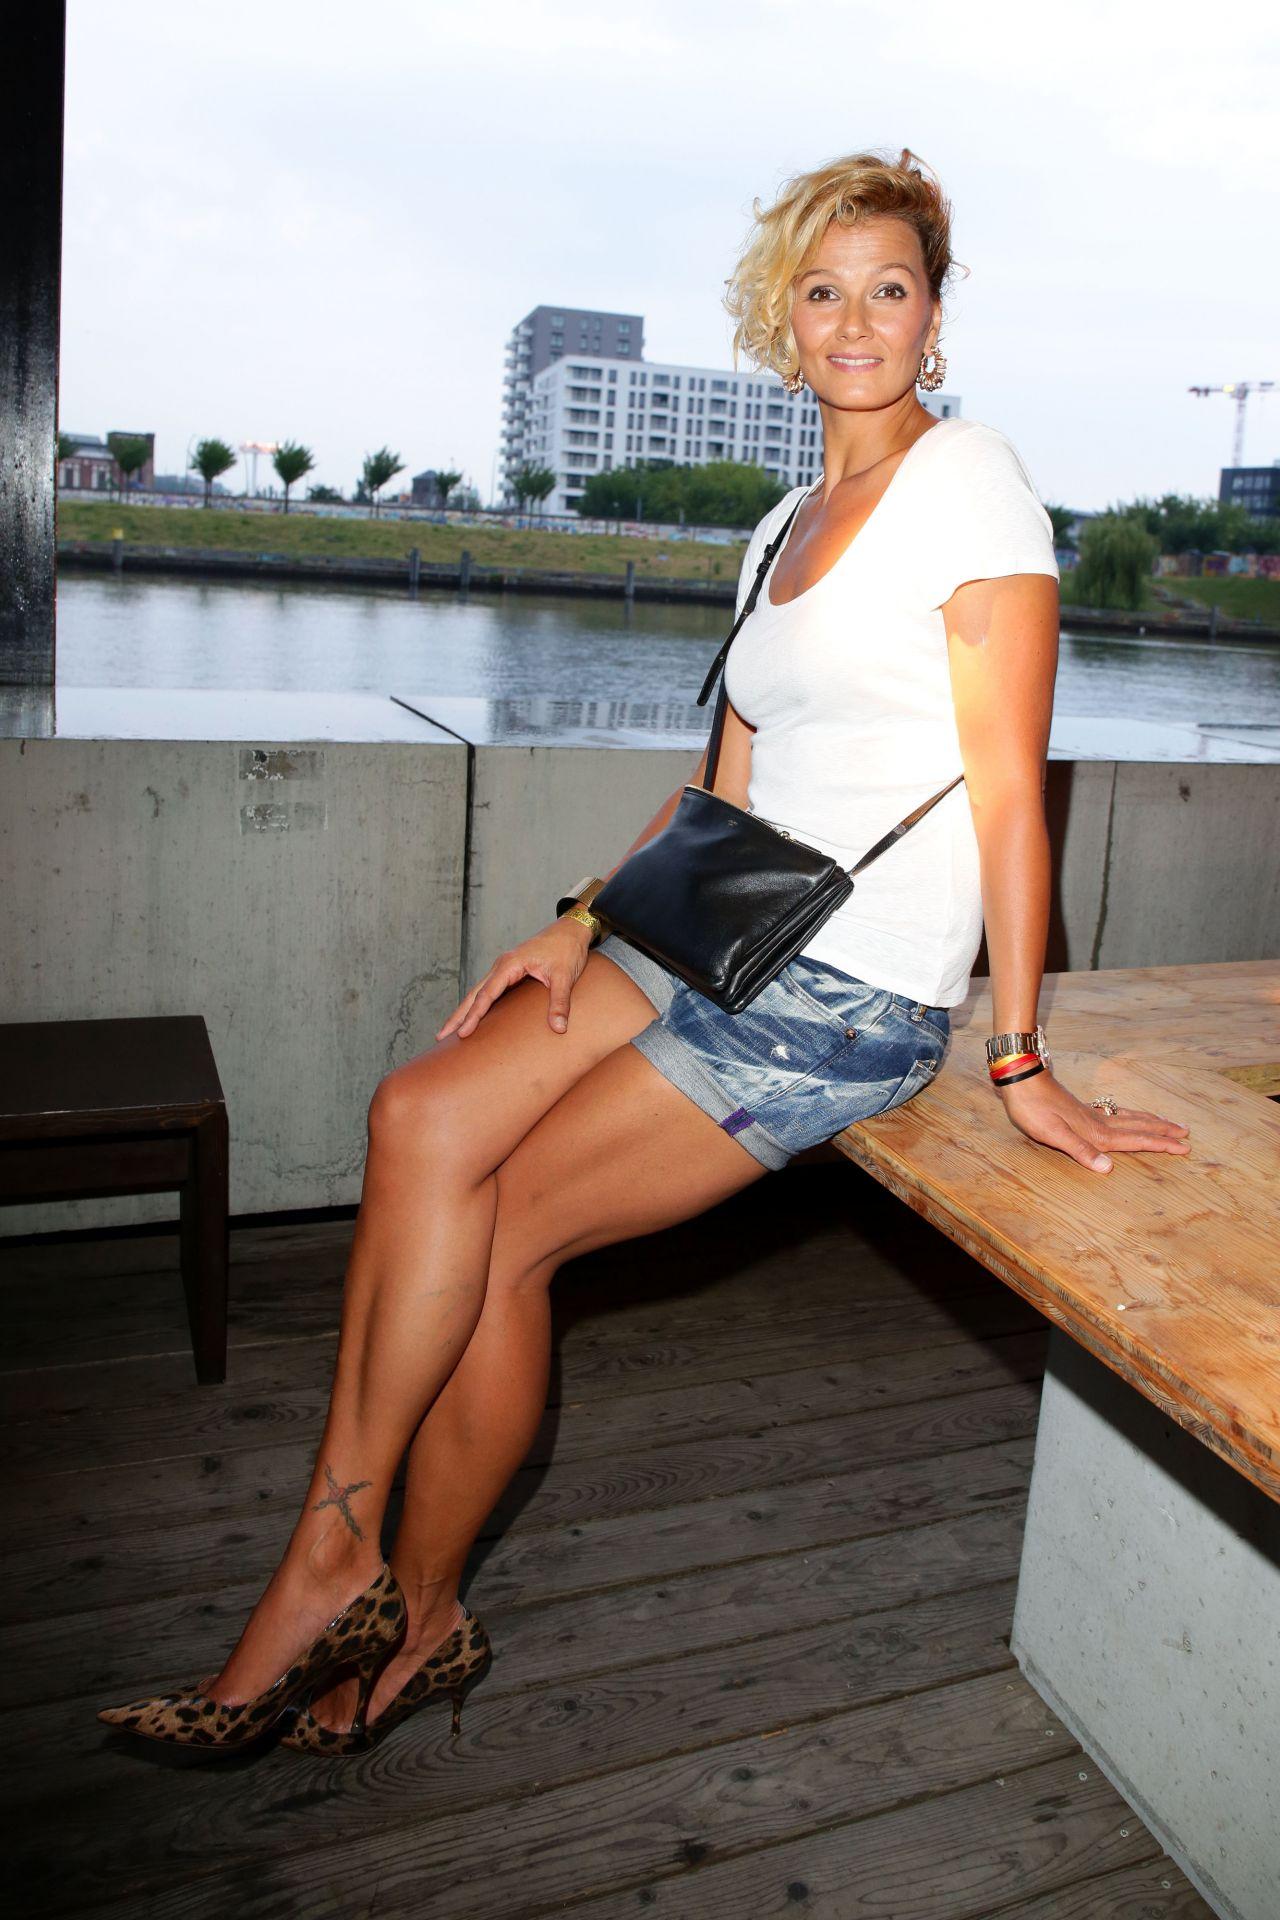 Franziska van Almsick  MercedesBenz Fashion Week in Berlin  July 2014